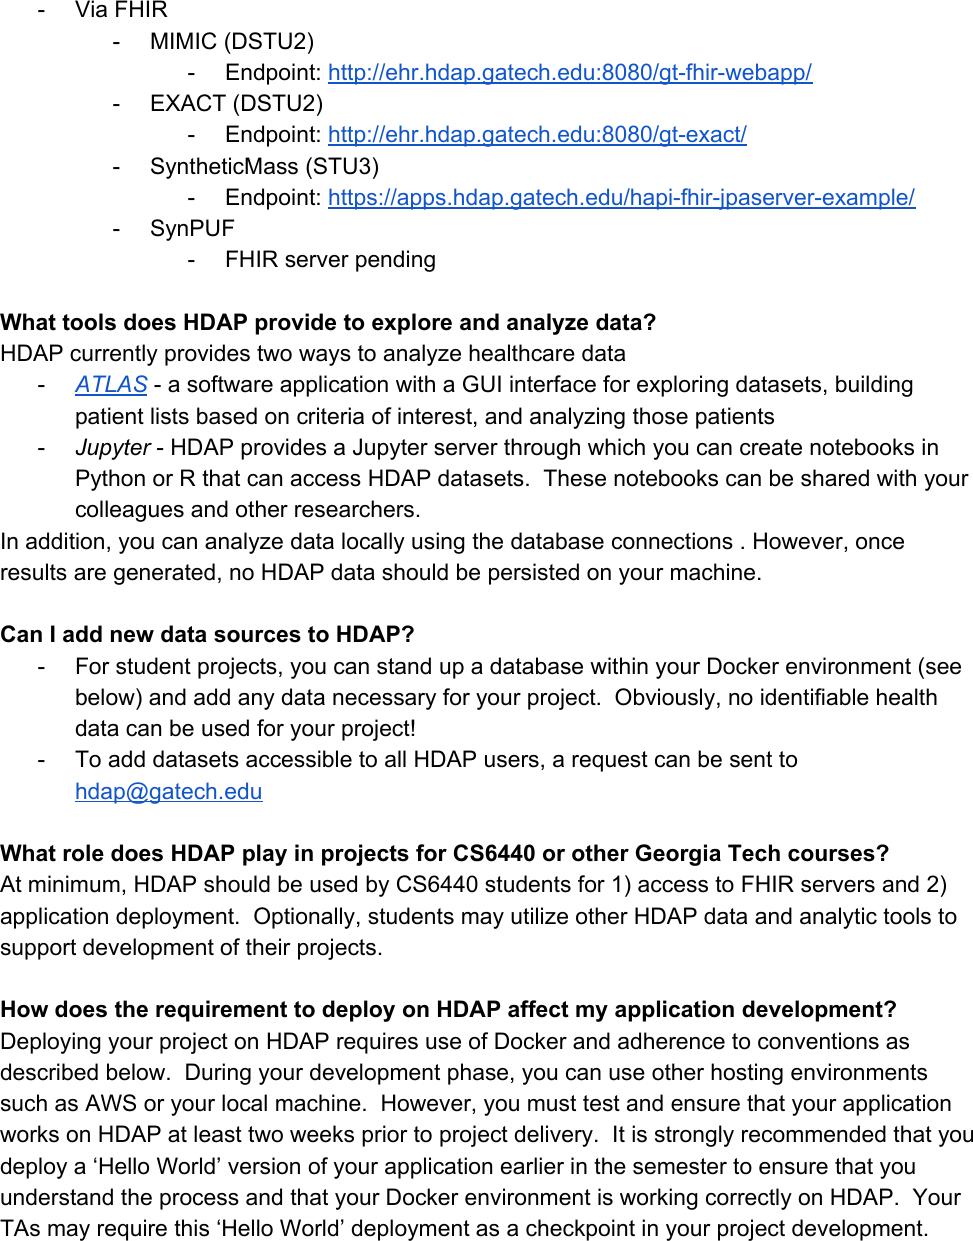 HDAP Guide